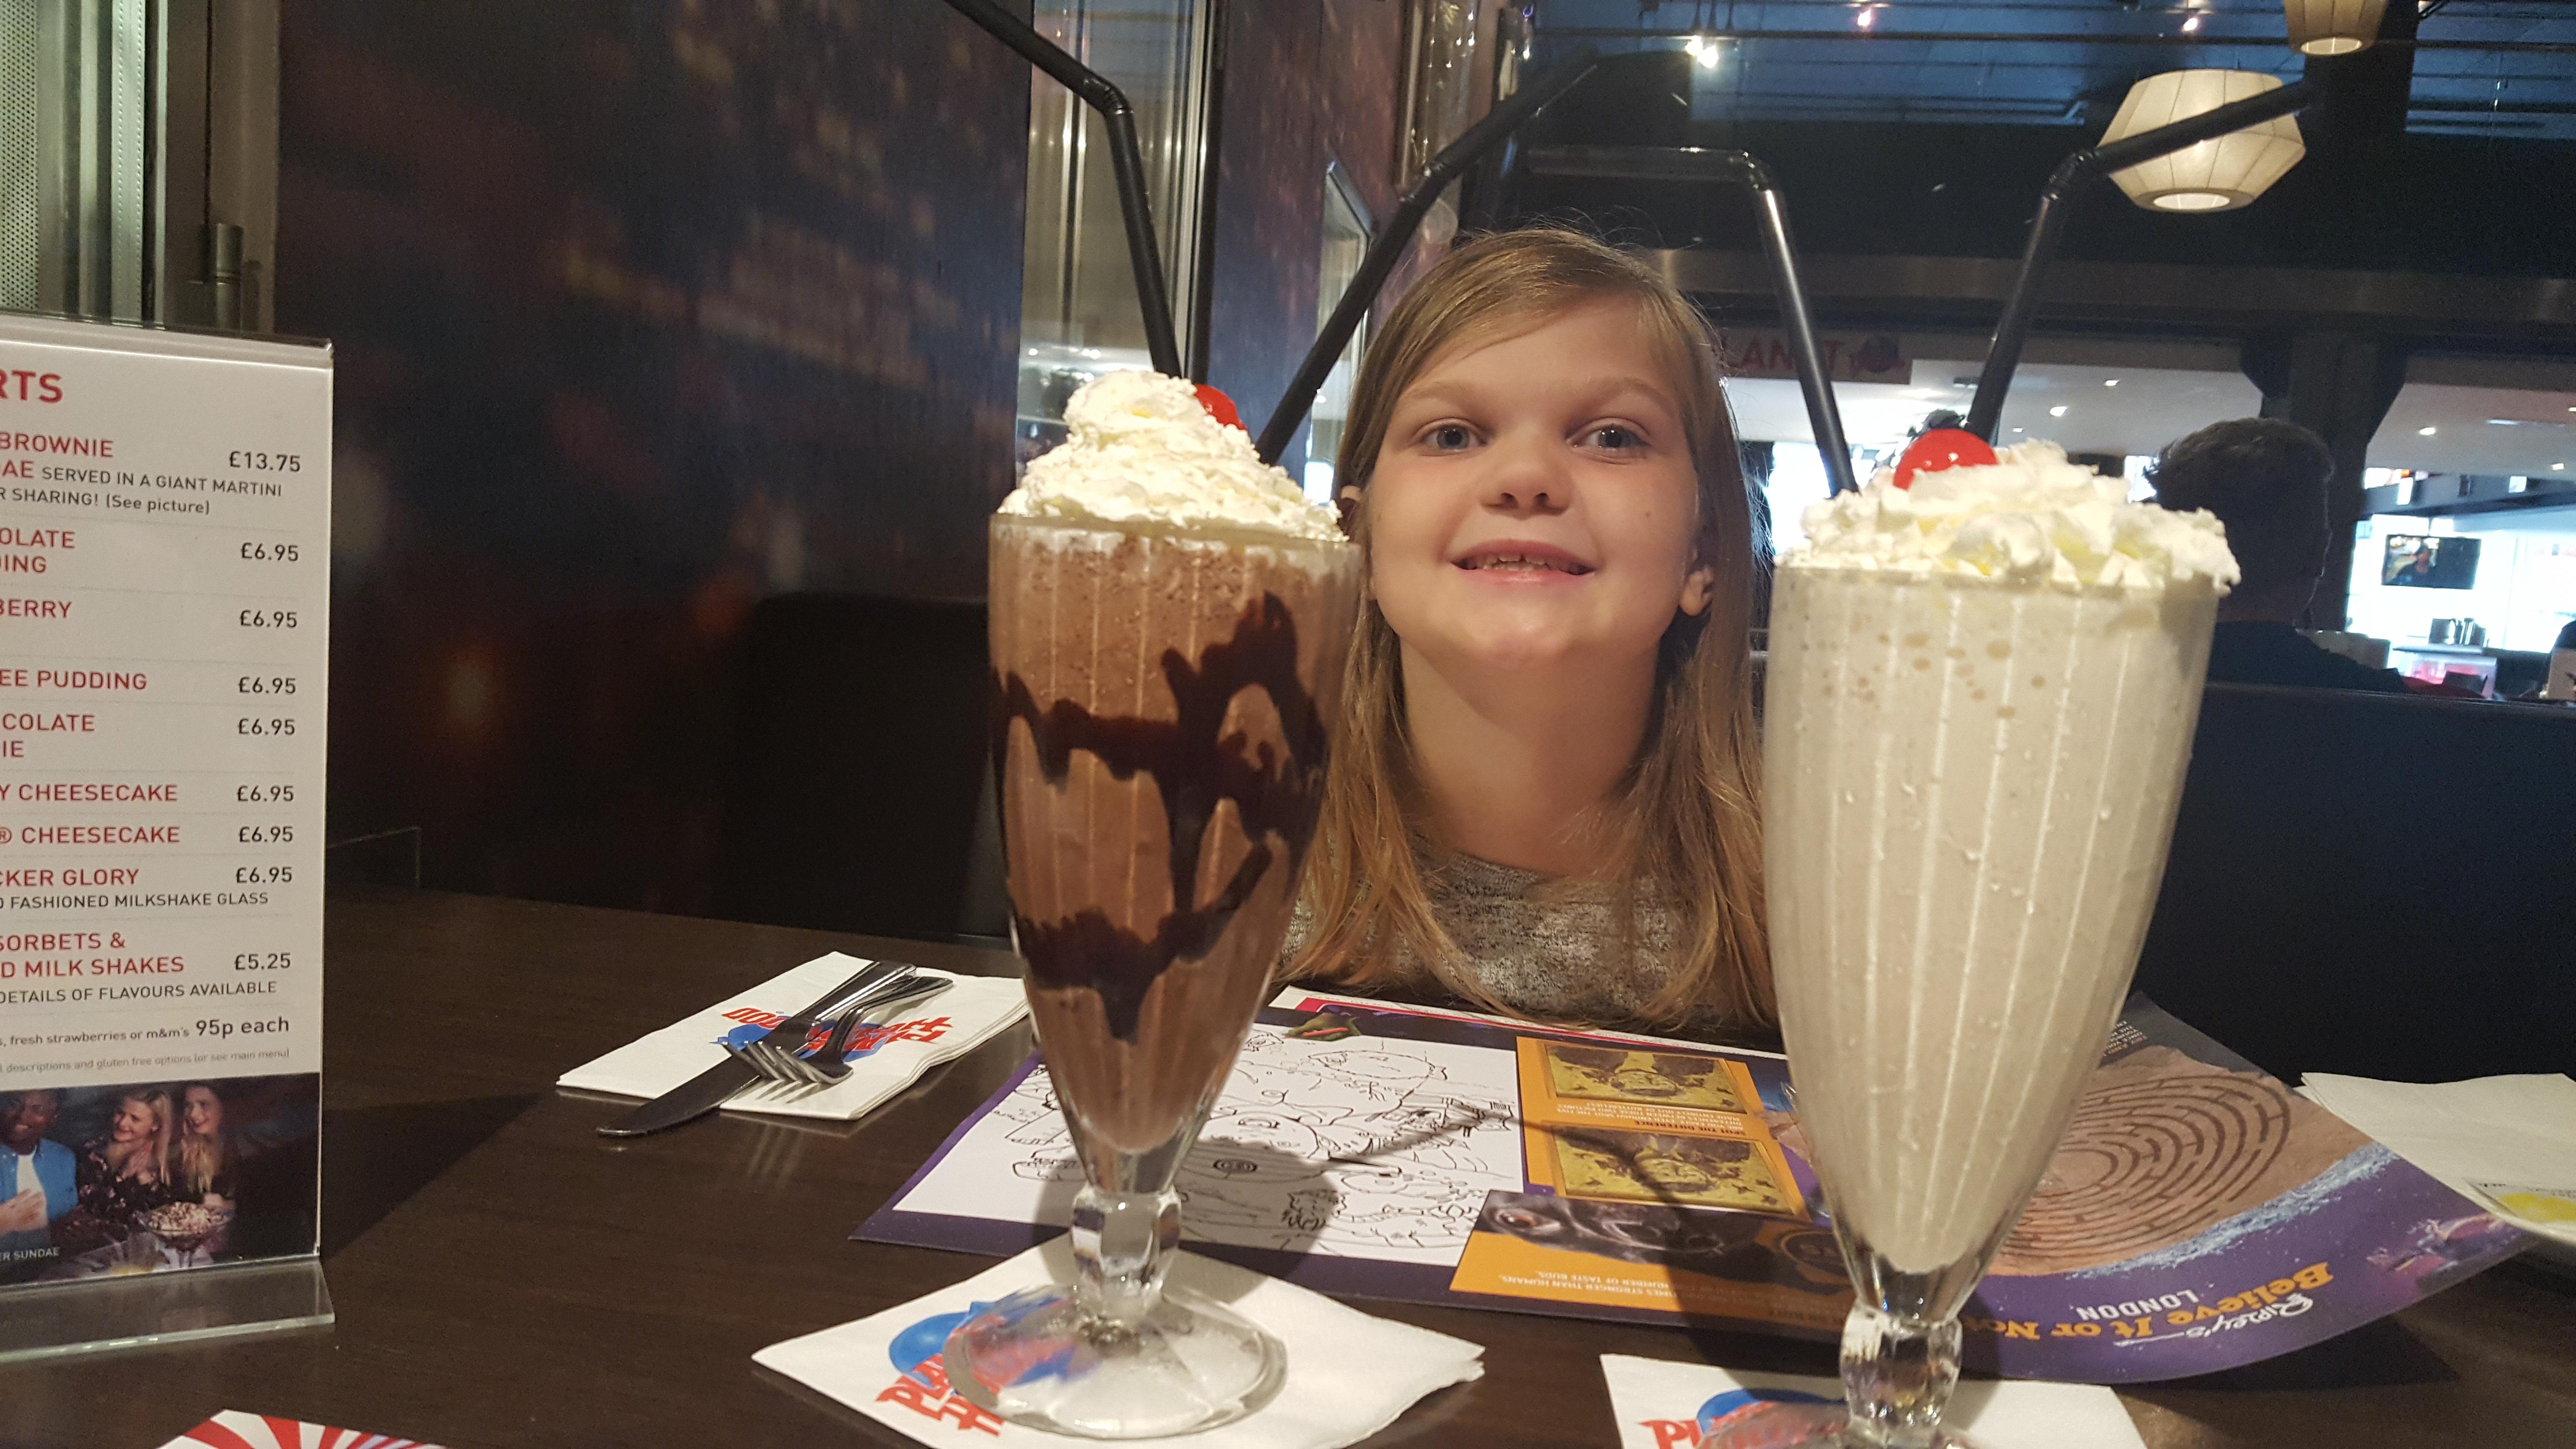 Eowyns milkshake at Planet Hollywood